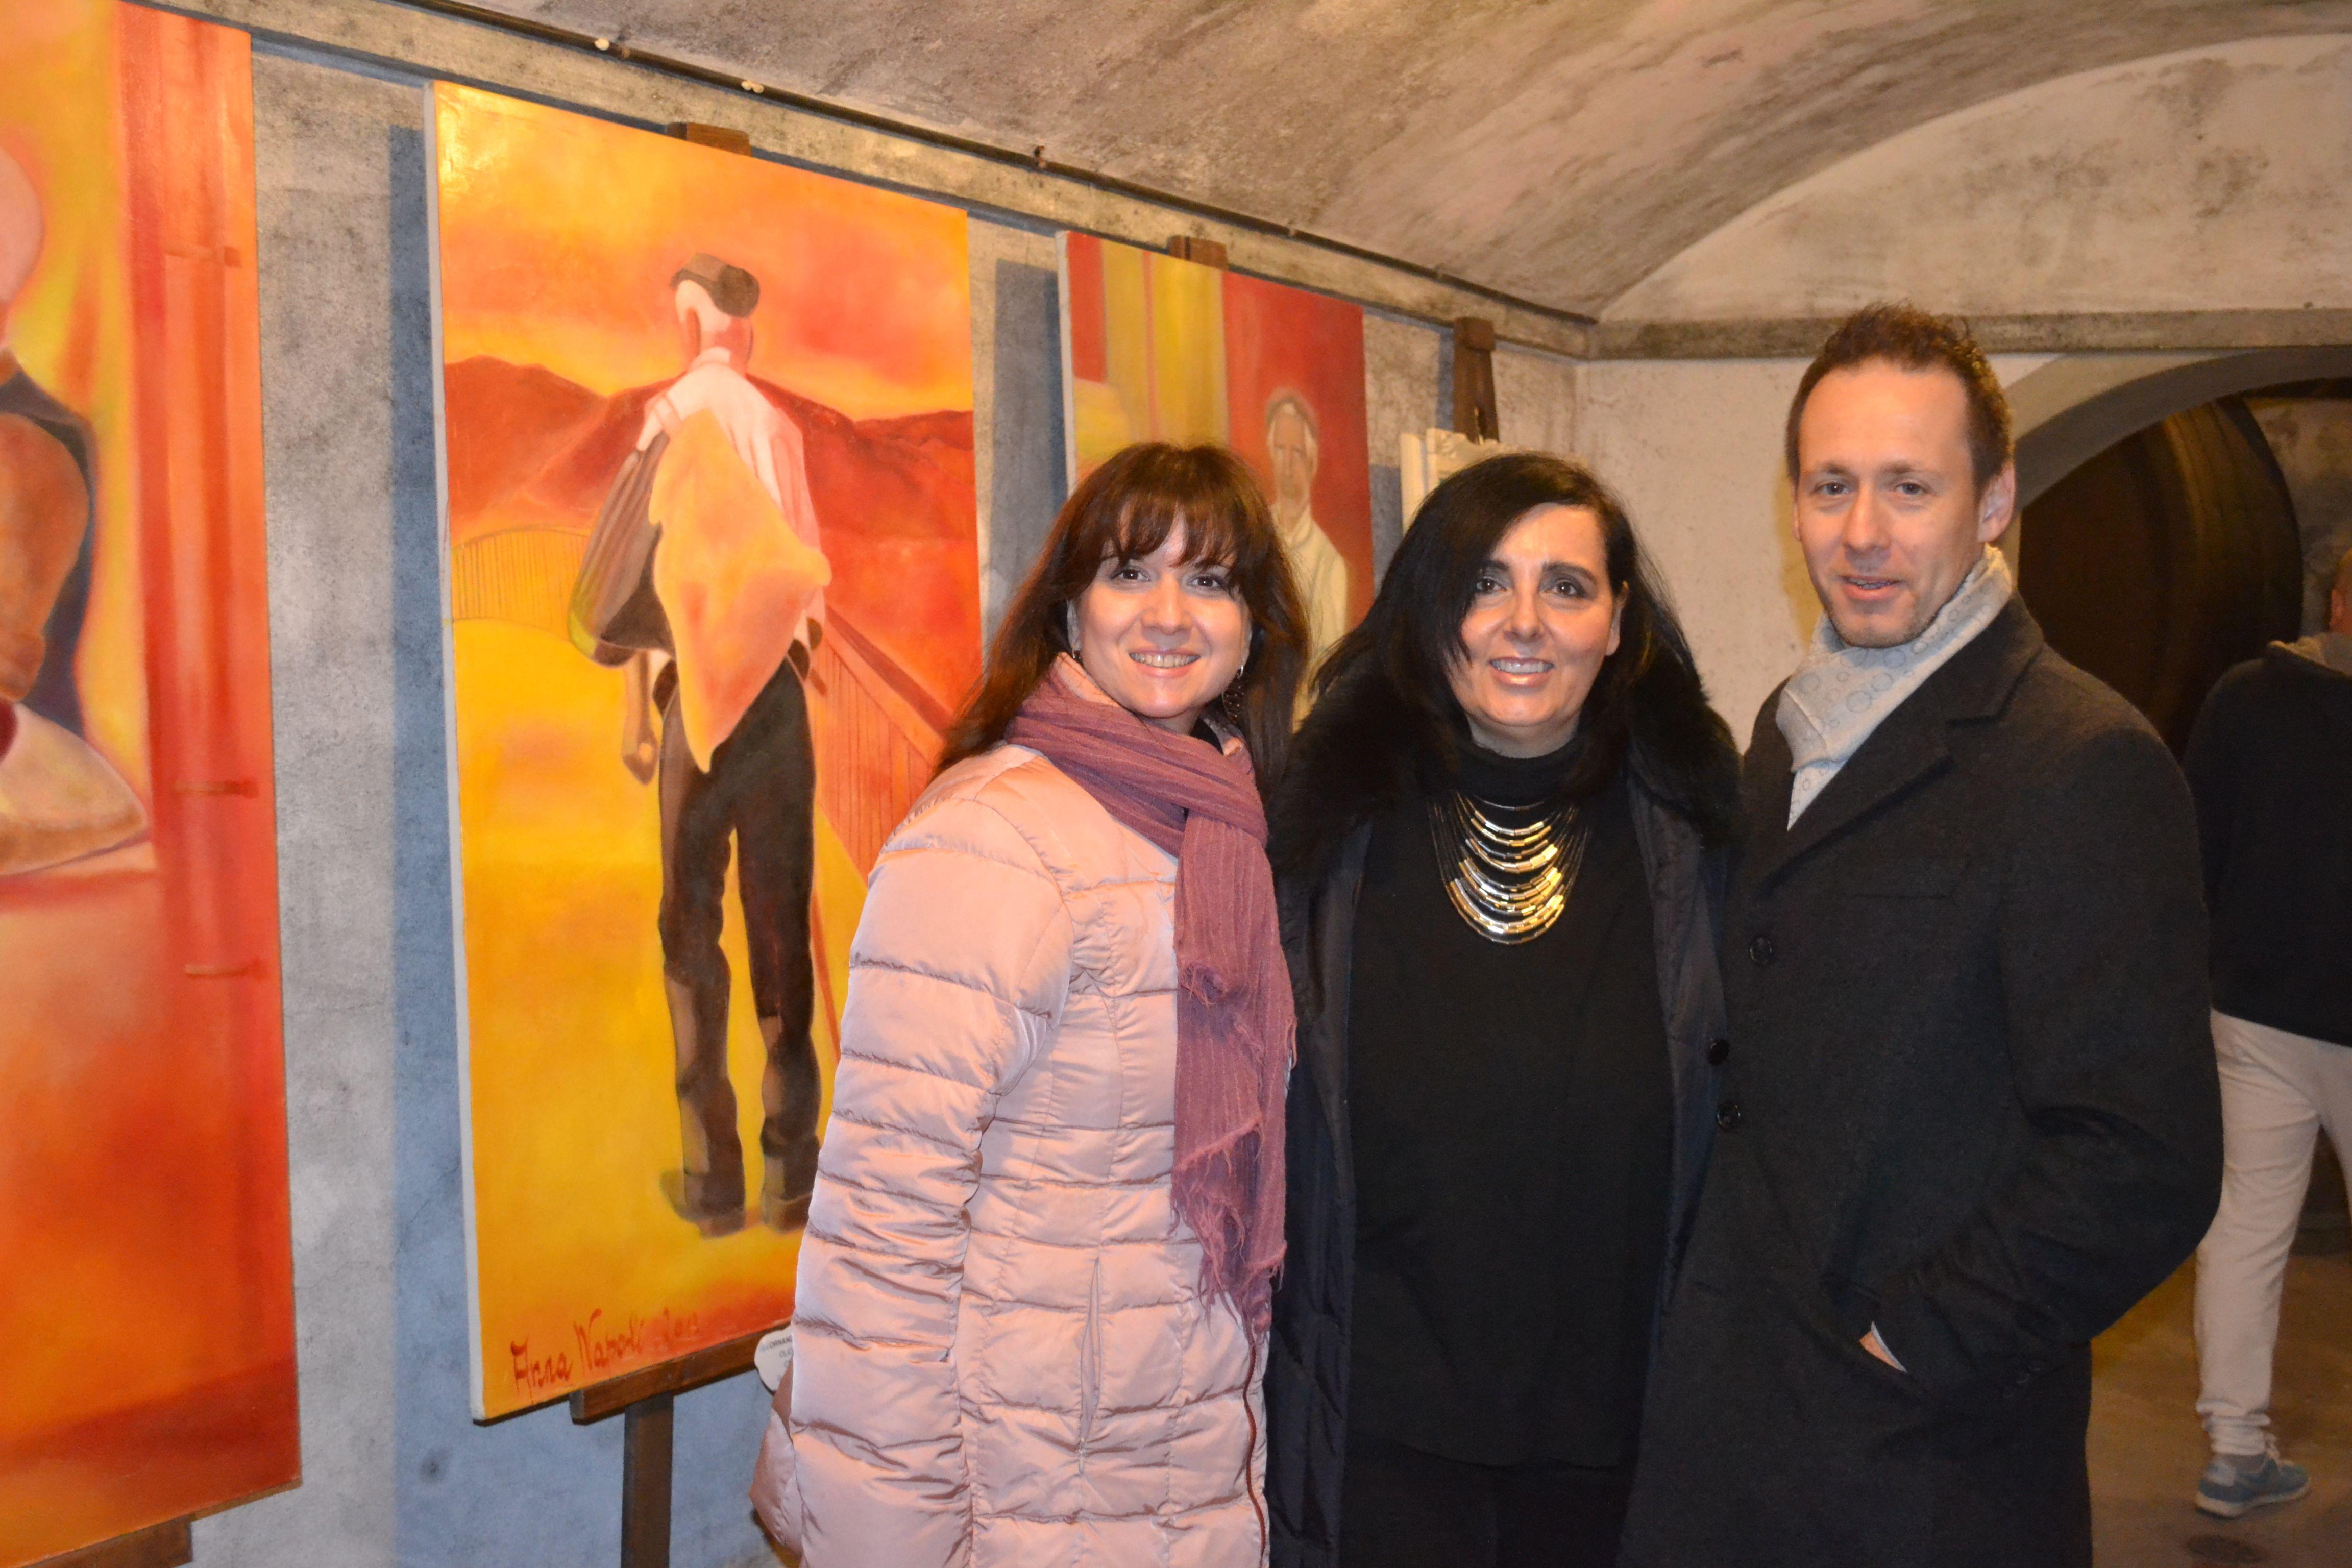 Erica e Mirko Cantine Verdi Villa Medicea 2014